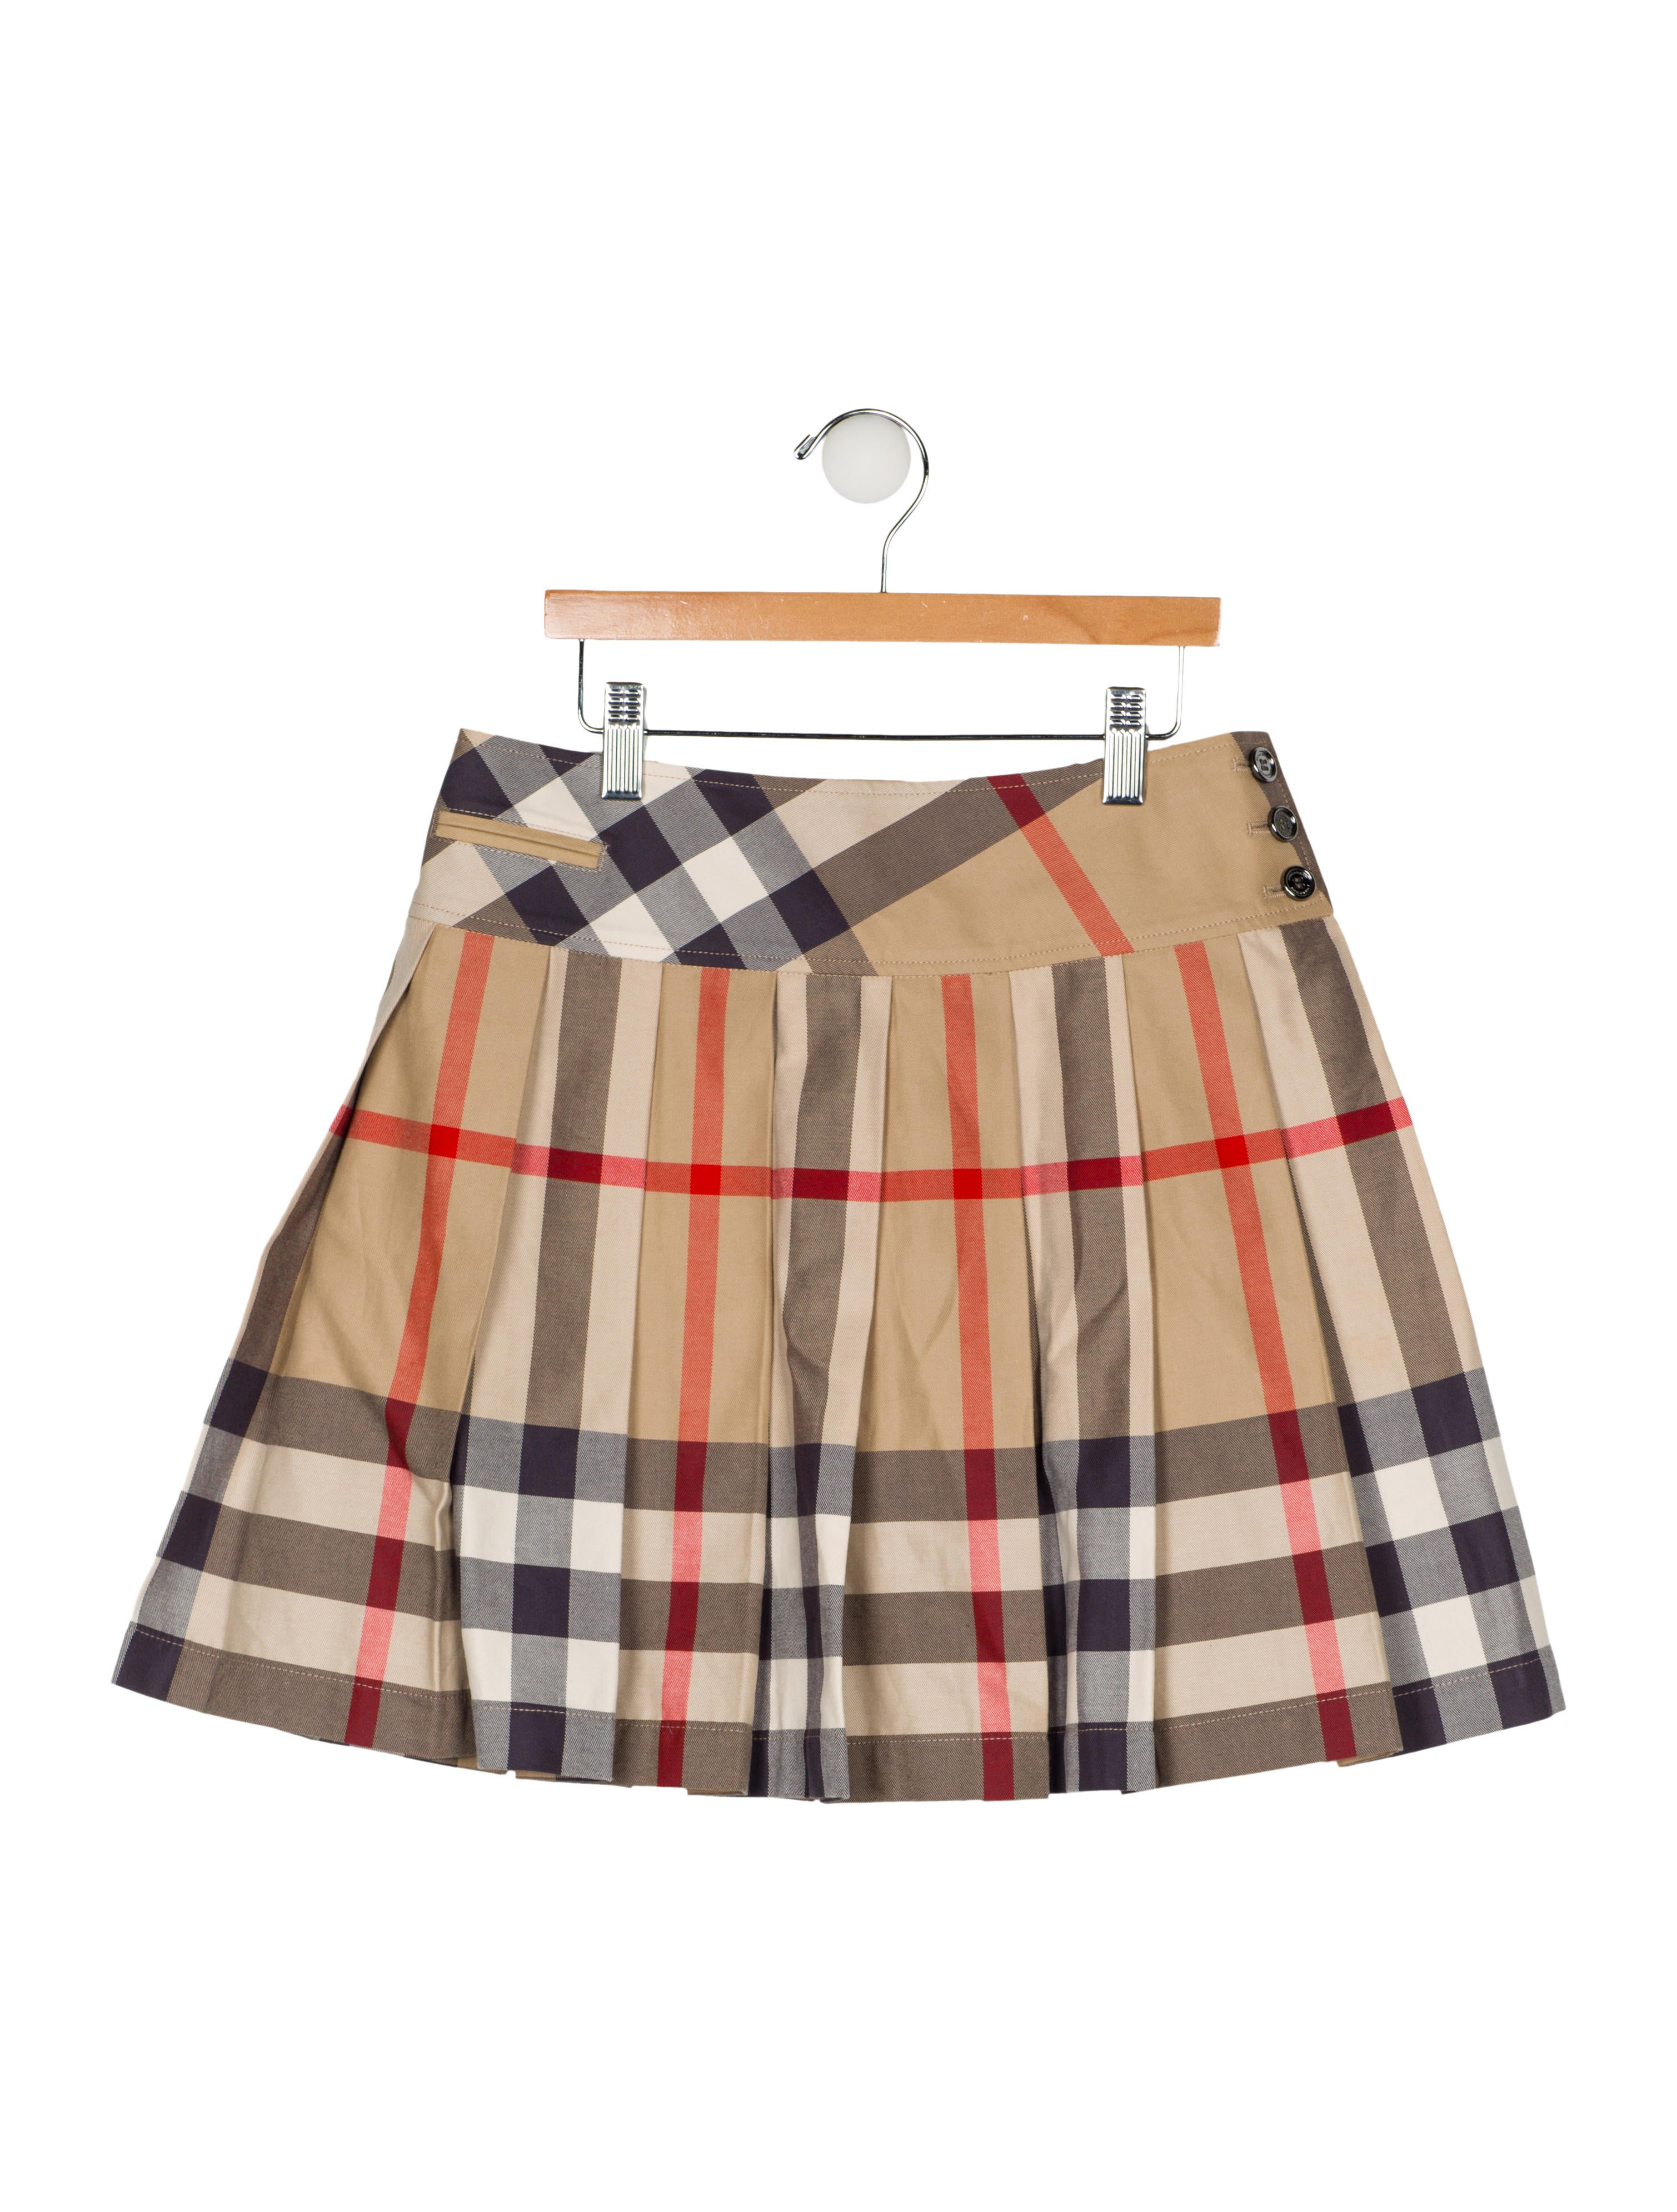 08d8f1b3b3 Burberry Girls' Pleated Nova Check Skirt - Girls - BUR107425   The ...